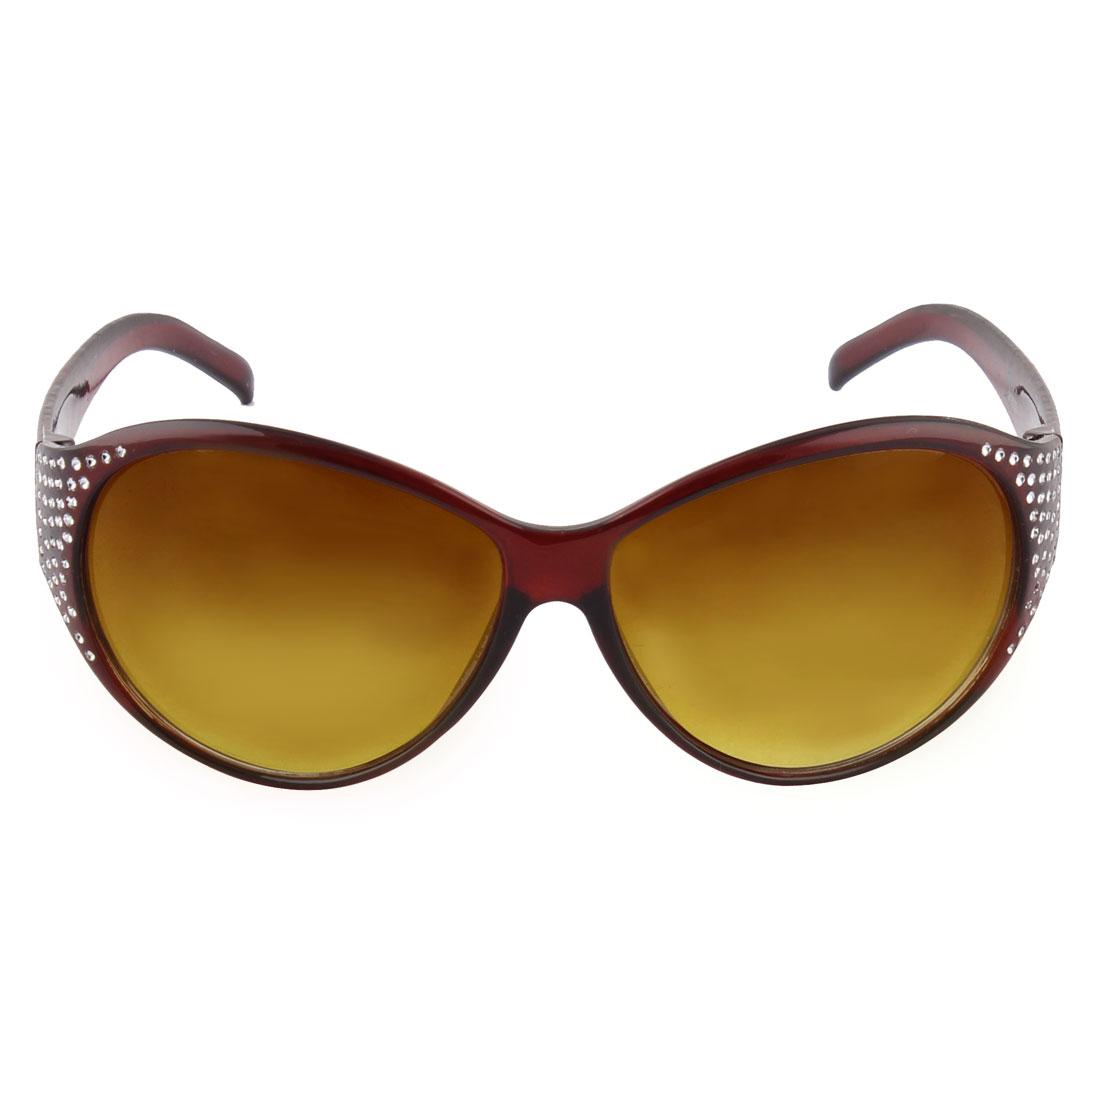 Lady Glamour Plastic Full Frame Rhinestone Sunglass Brown